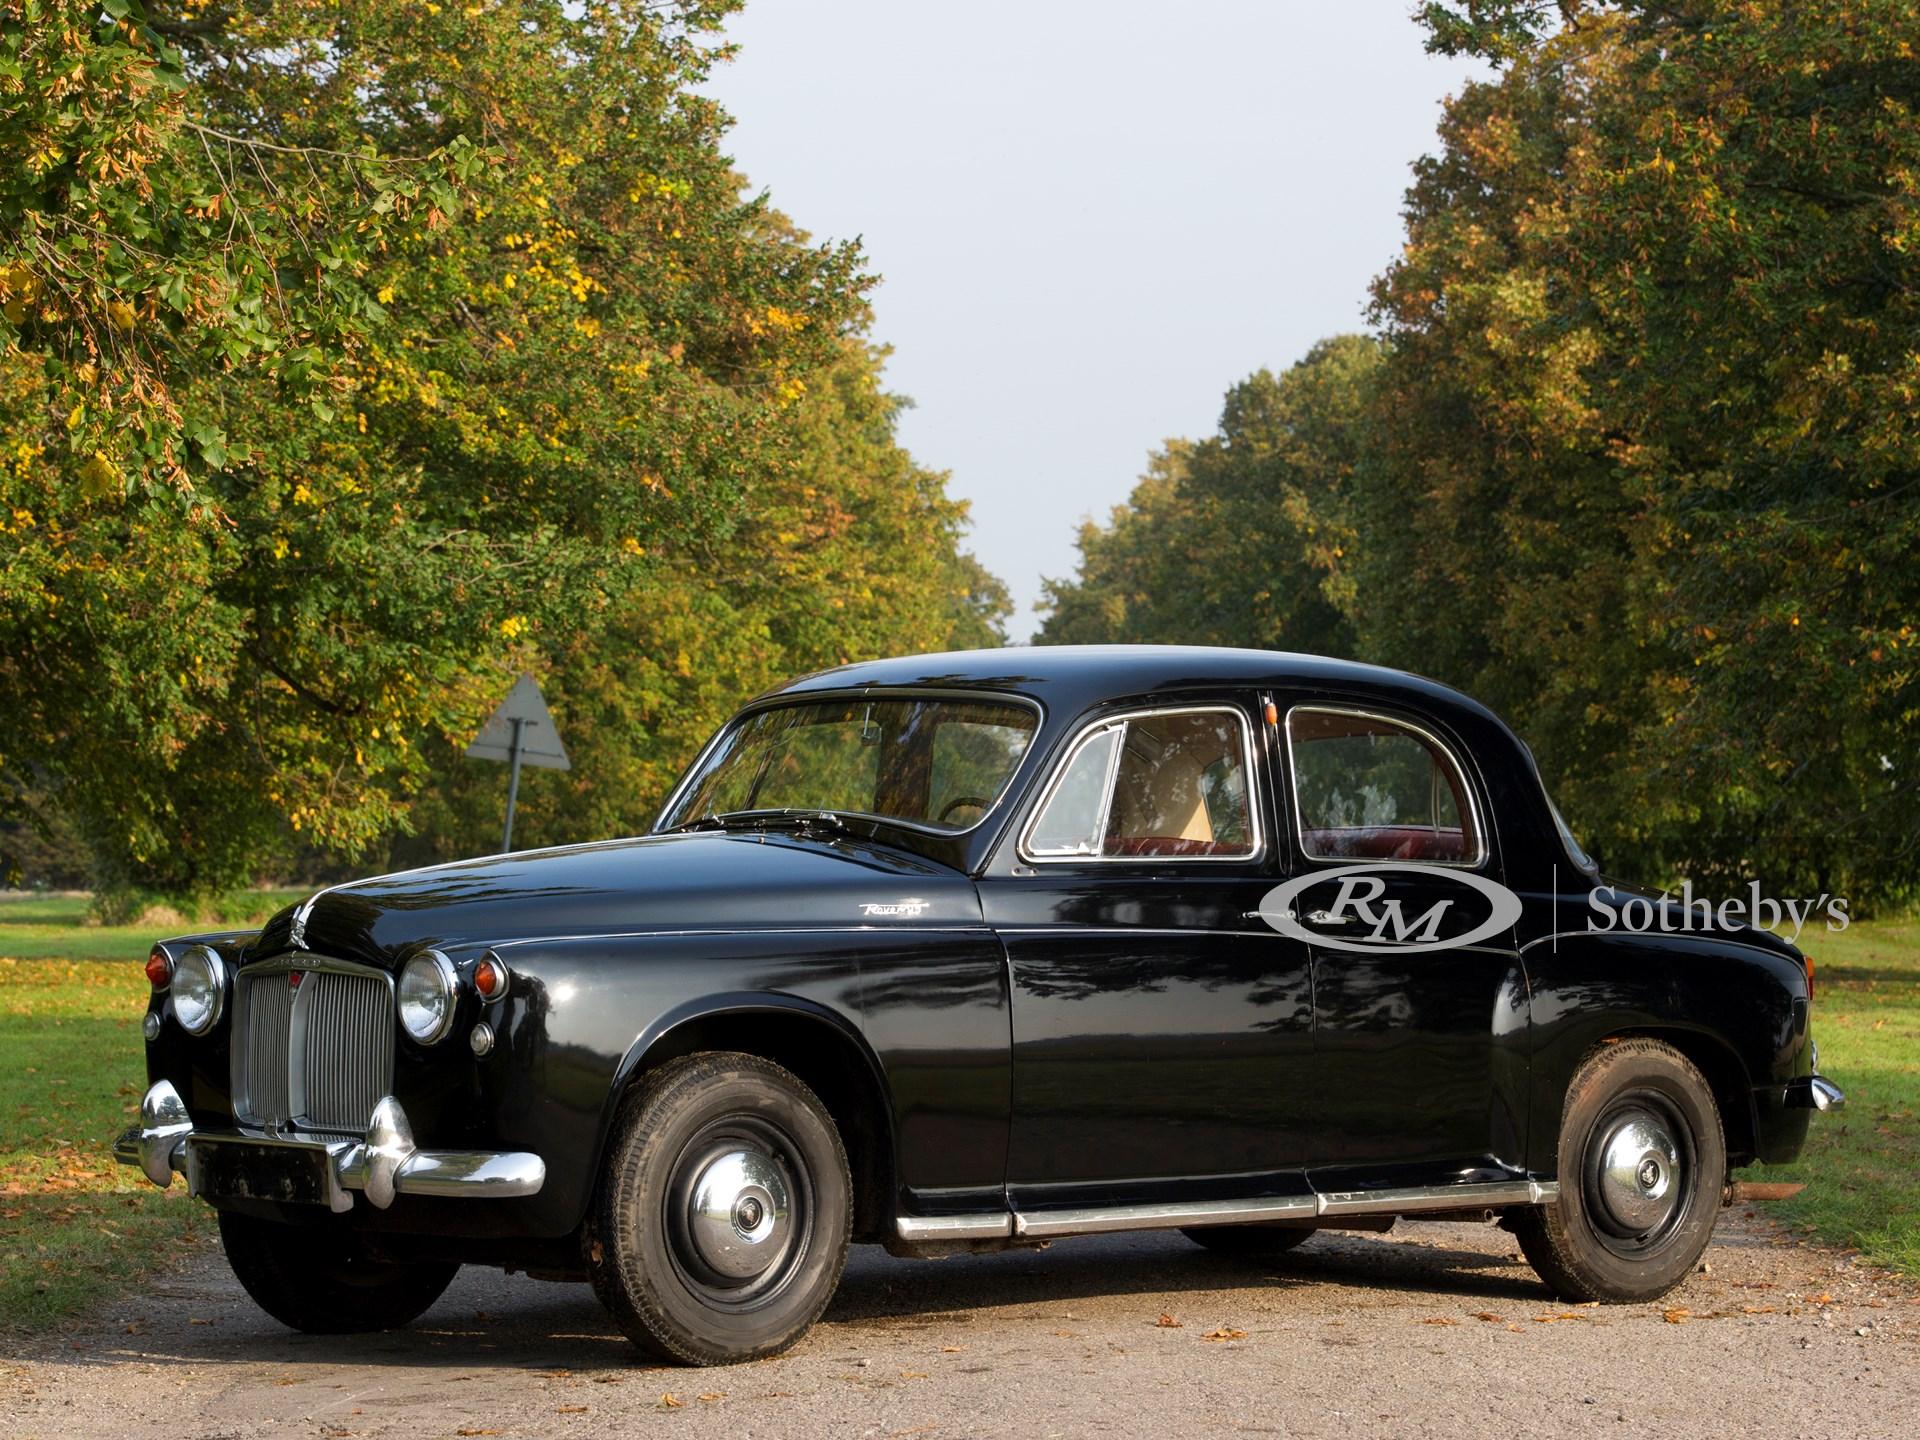 1964 Rover 95 Saloon